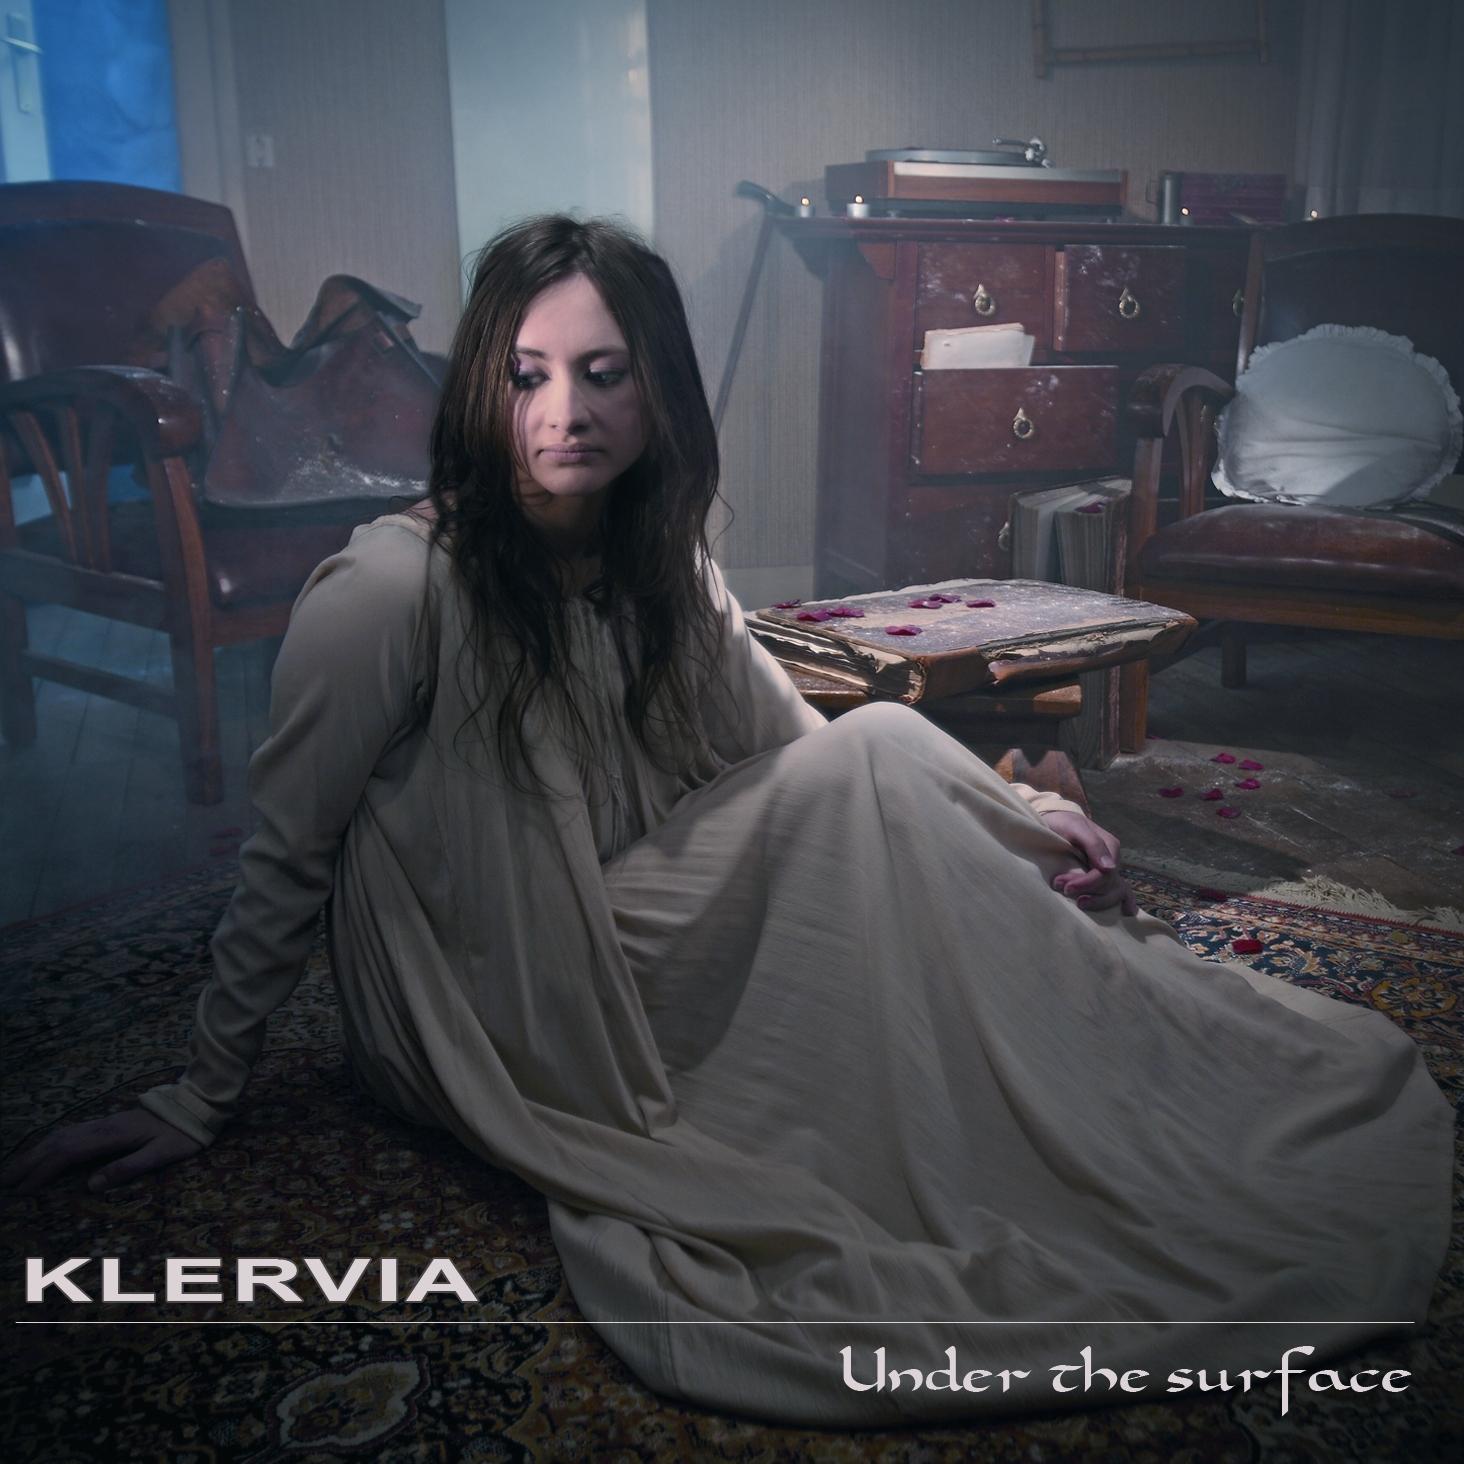 Under the surface - Klervia